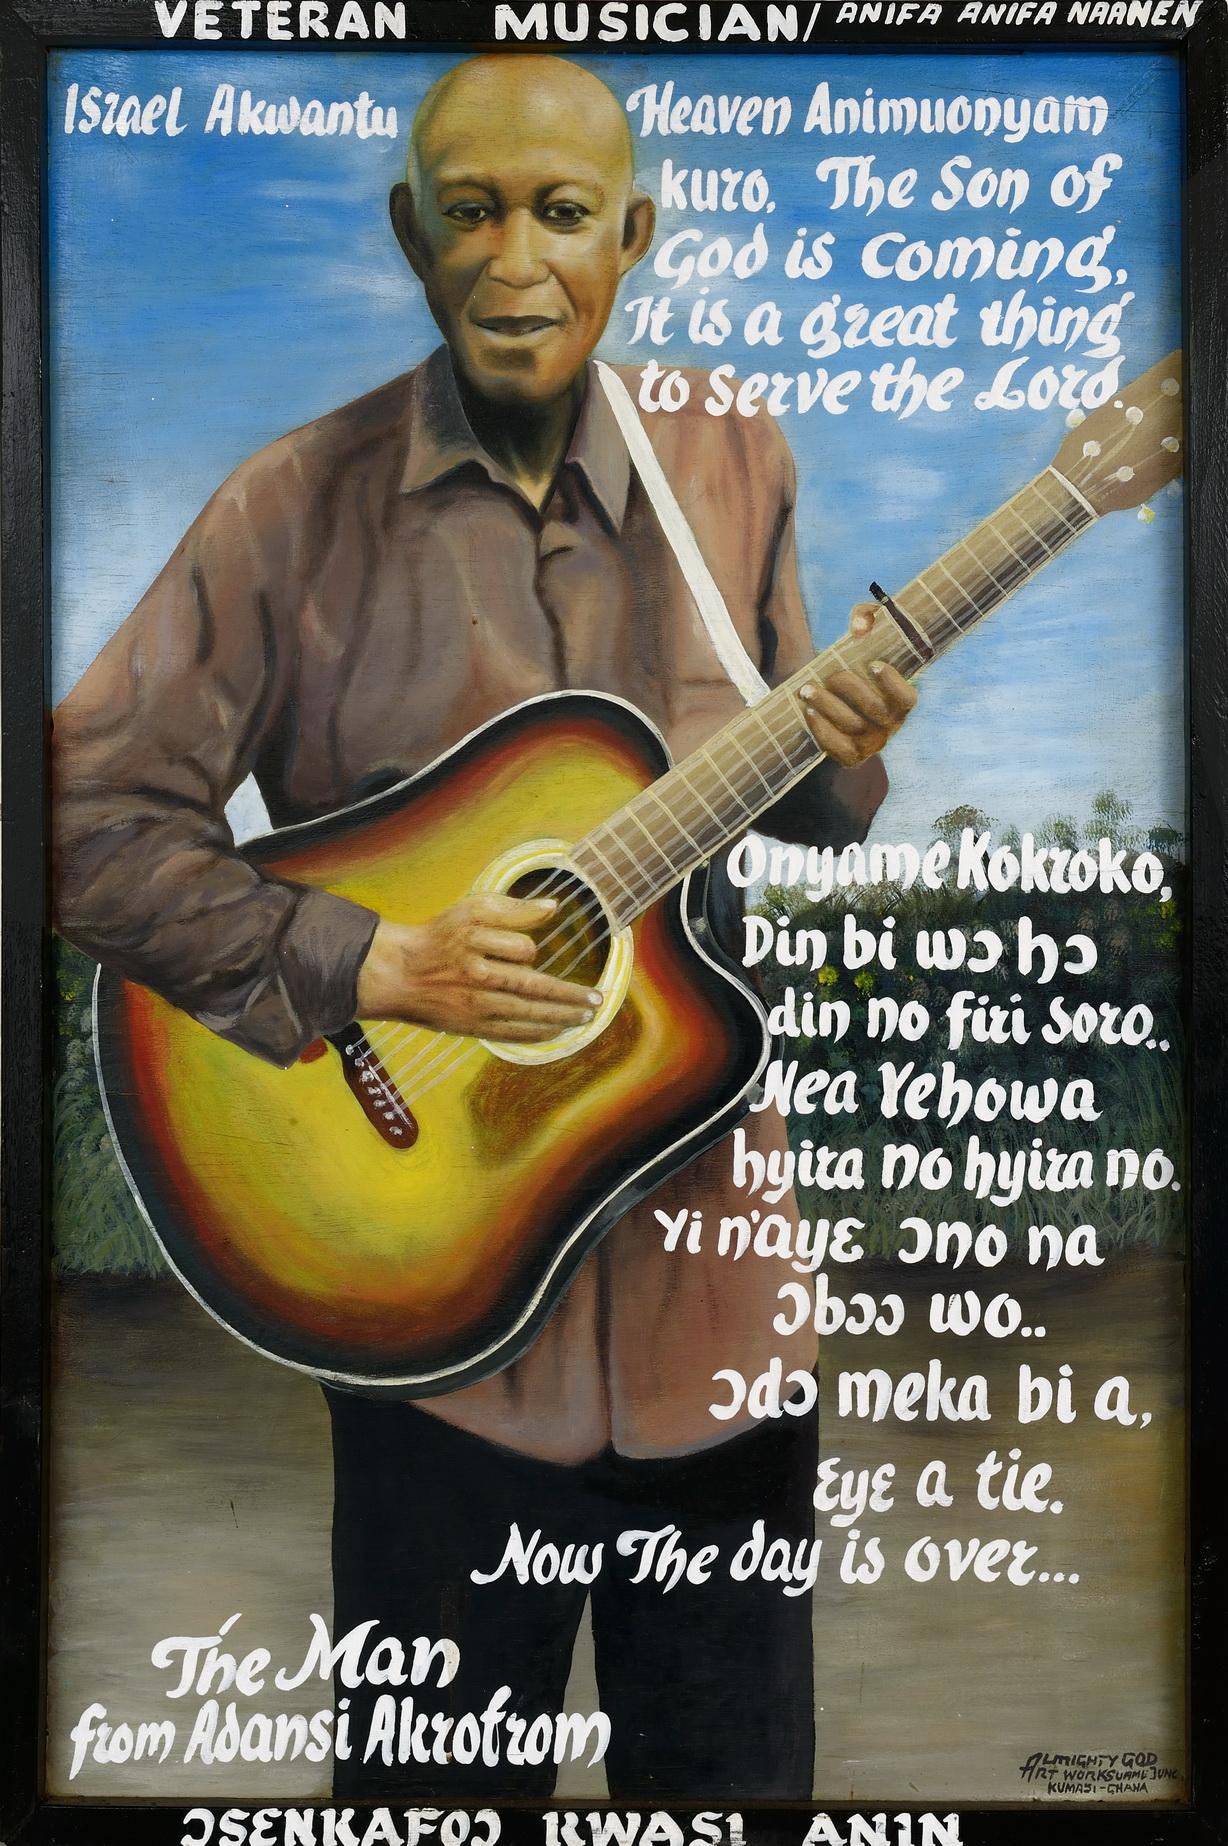 Veteran musician